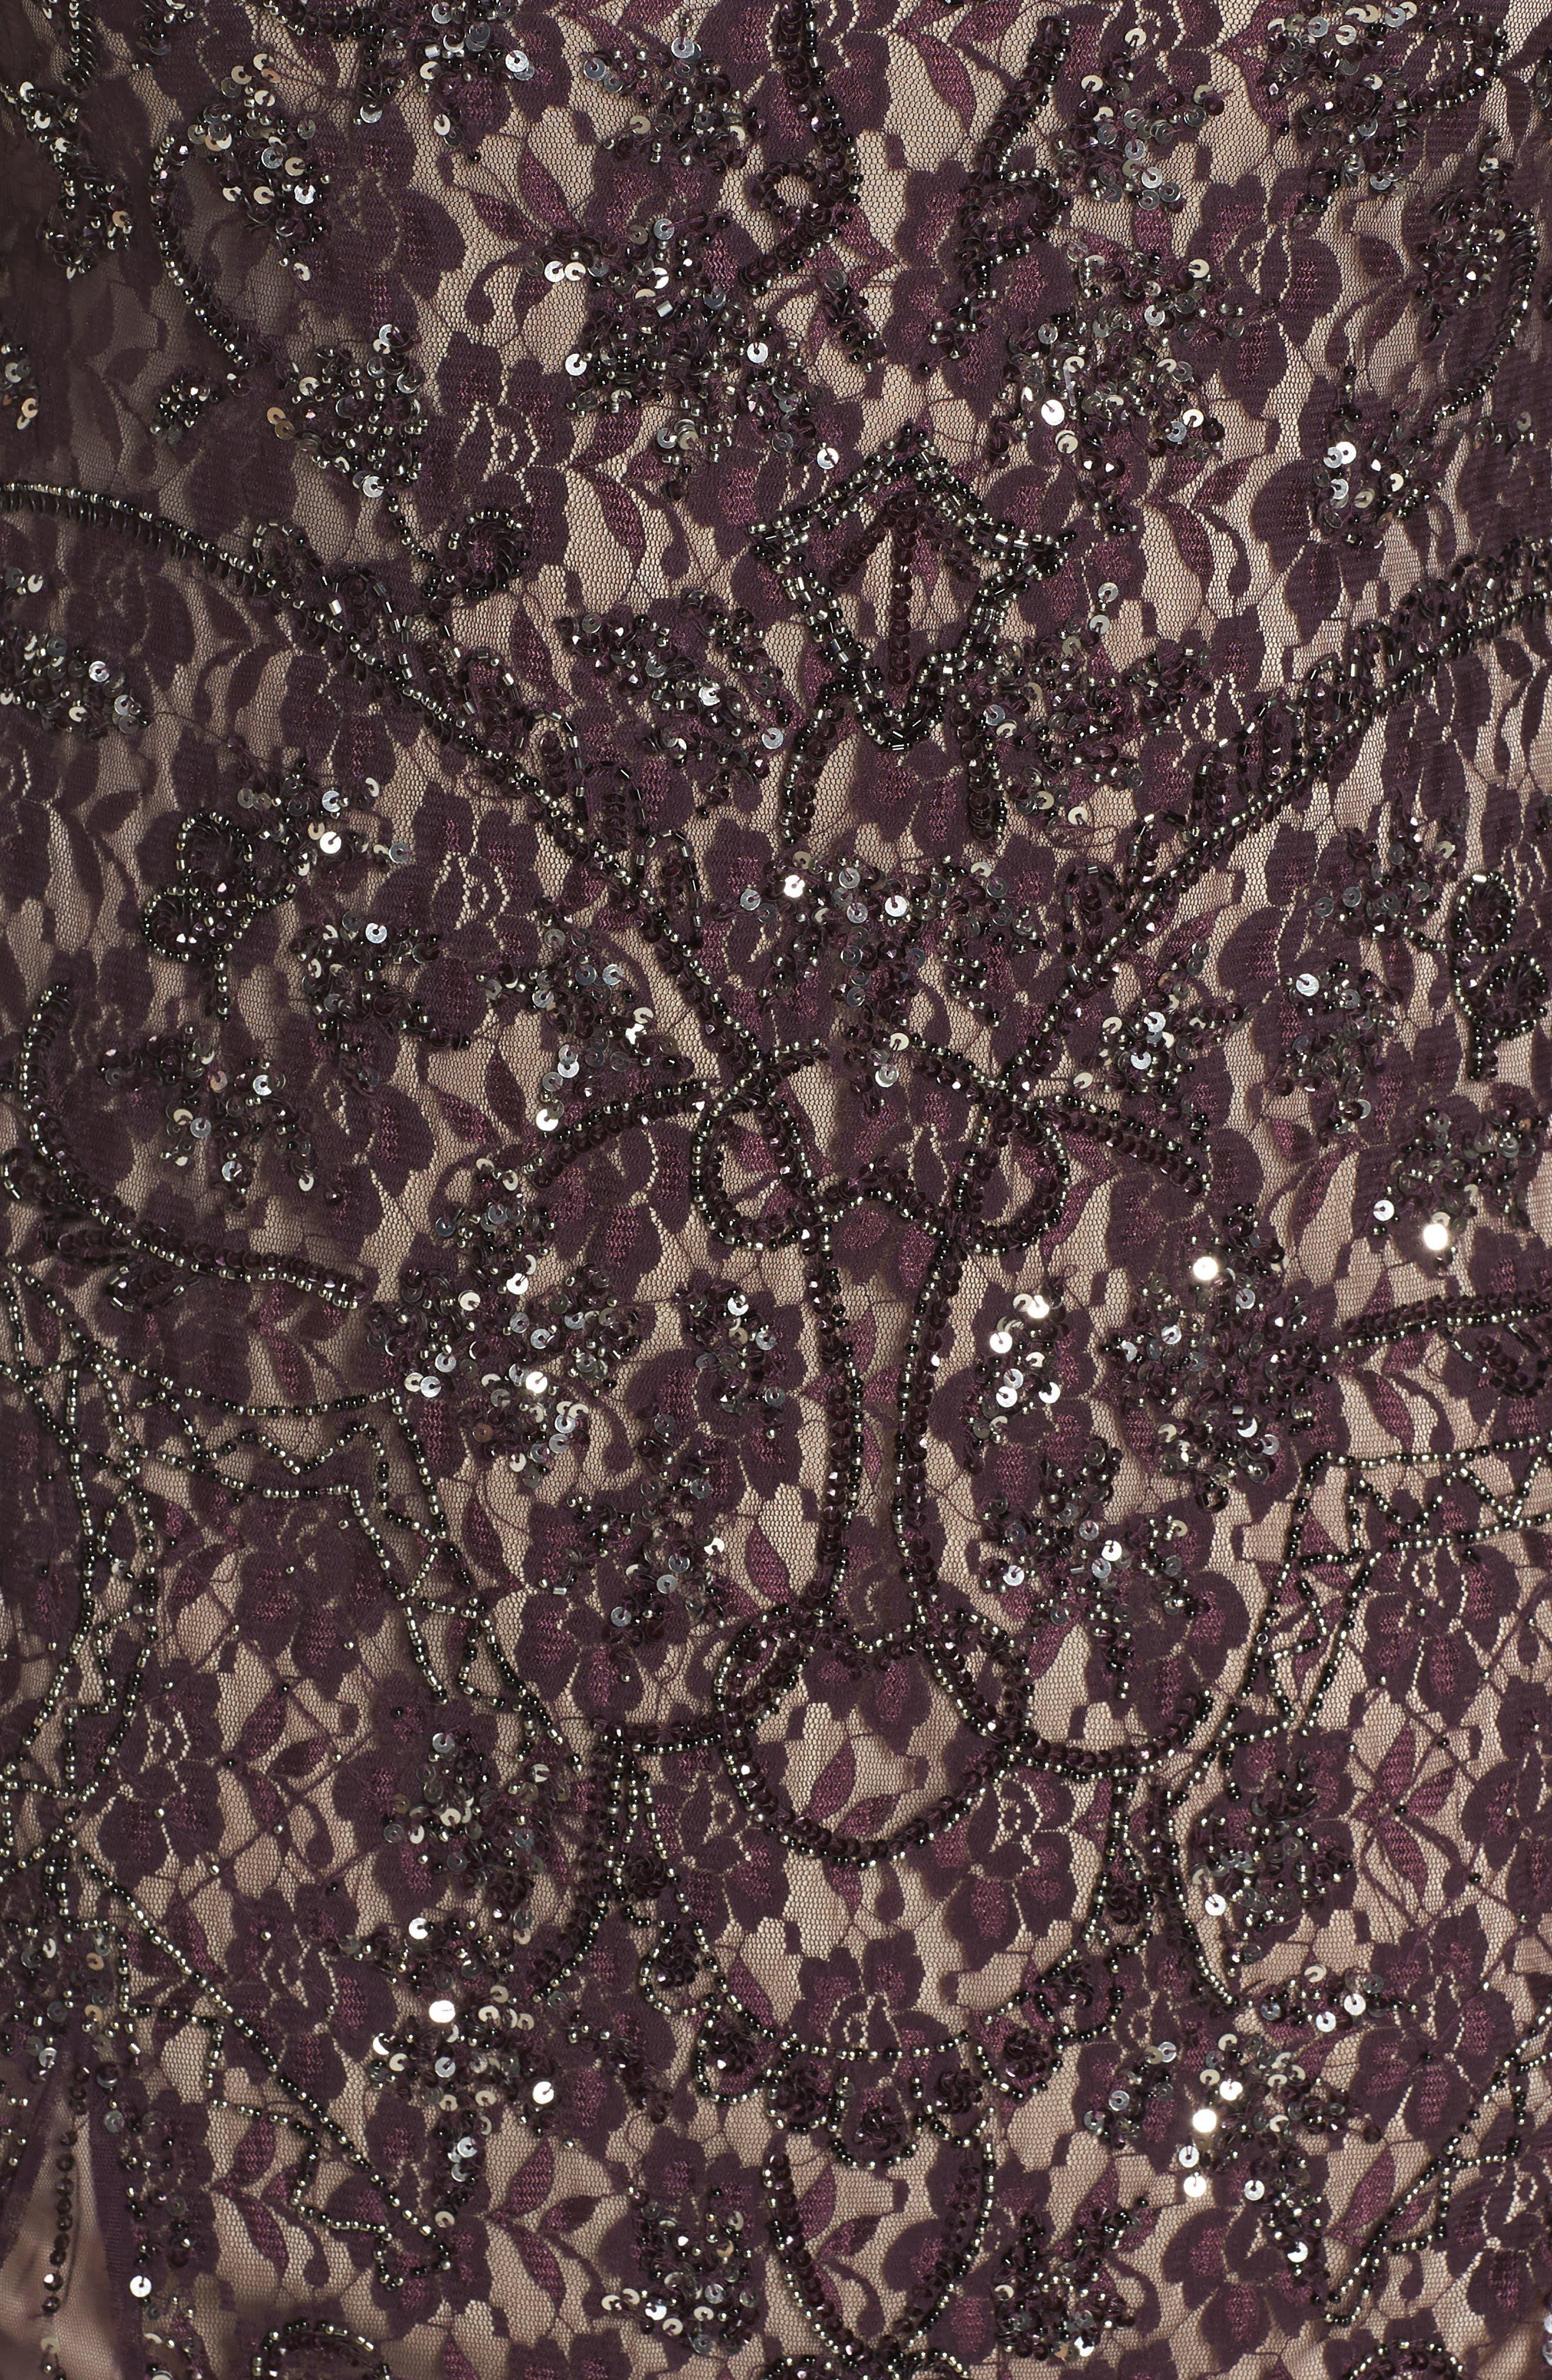 Embellished Lace A-Line Dress,                             Alternate thumbnail 5, color,                             502